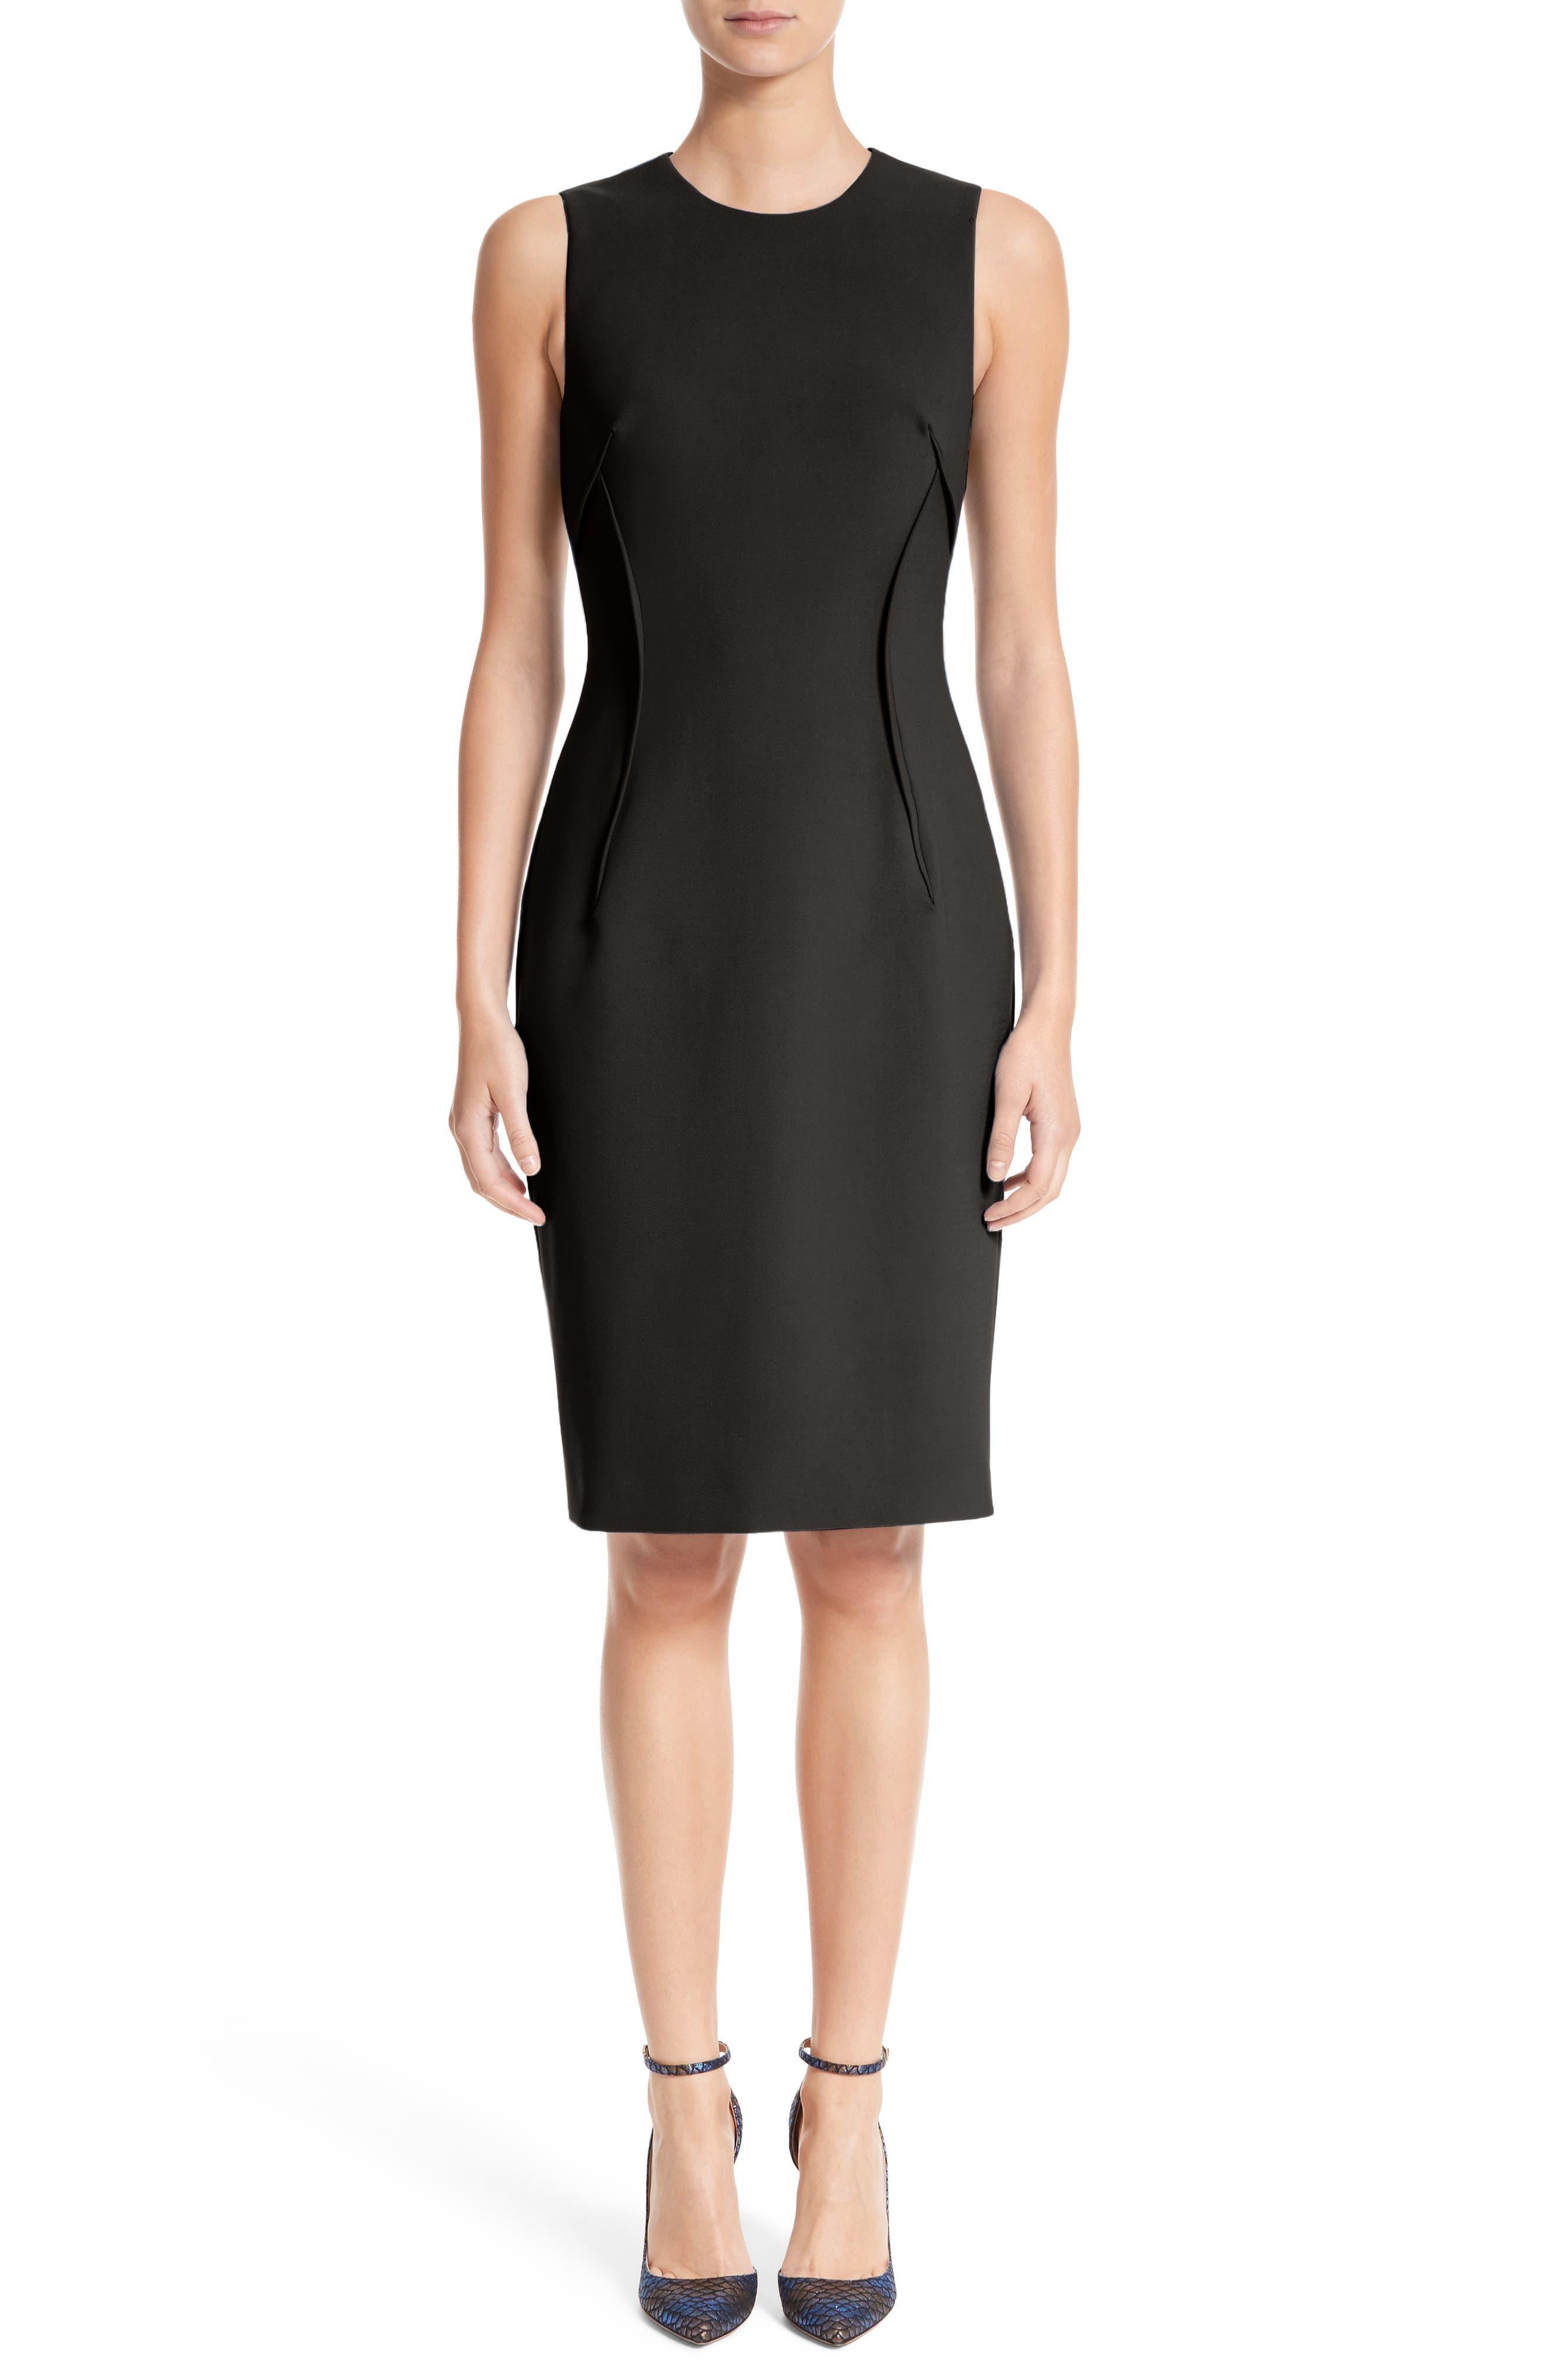 VERSACE COLLECTION Stretch Cady Sheath Dress, Main, color, BLACK